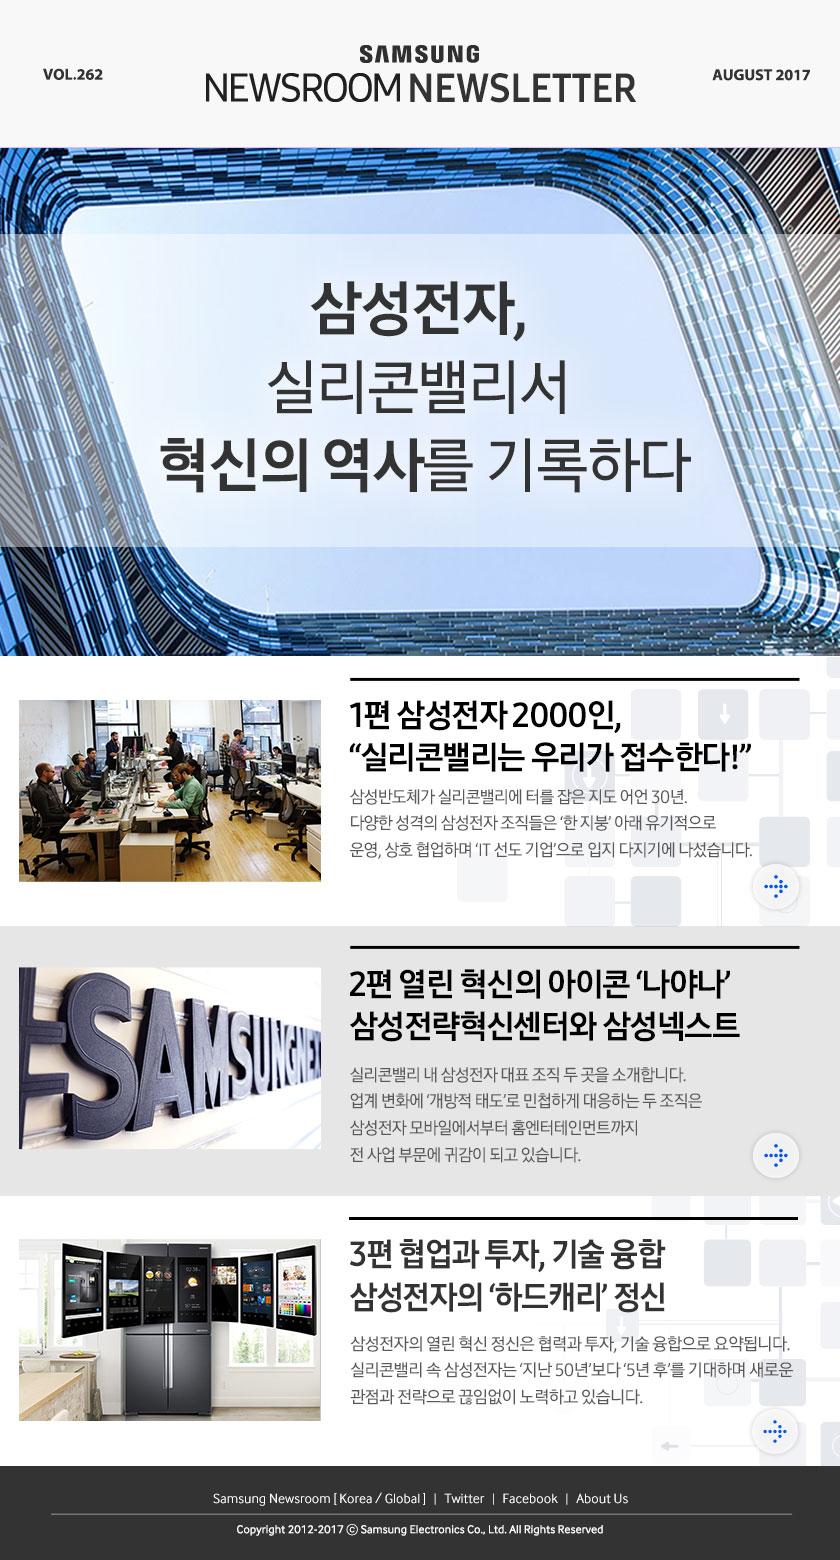 Samsung Newsroom Newsletter Vol.262, AUGUST 2017, 삼성전자, 실리콘밸리서 혁신의 역사를 기록하다, 1편 삼성전자 2000인, '실리콘밸리는 우리가 접수한다!' 삼성반도체가 실리콘밸리에 터를 잡은 지도 어언 30년. 다양한 성격의 삼성전자 조직들은 '한 지붕'아래 유기적으로 운영, 상호 협업하며'IT 선도 기업'으로 입지 다지기에 나섰습니다. 2편 열린 혁신의 아이콘 '나야나' 삼성전략혁신센터와 삼성넥스트, 실리콘밸리 내 삼성전자 대표 조직 두 곳을 소개합니다. 업계 변화에 '개방적 태도'로 민첩하게 대응하는 두 조직은 삼성전자 모바일에서부터 홈엔터테인먼트까지 전 사업 부문에 귀감이 되고 있습니다. 3편 협업과 투자, 기술 융합 삼성전자의 '하드캐리'정신, 삼성전자의 열린 혁신 정신은 협력과 투자, 기술 융합으로 요약됩니다. 실리콘밸리 속 삼성전자는 '지난 50년'보다 '5년 후'를 기대하며 새로운 관점과 전략으로 끊임없이 노력하고 있습니다. , Samsung Newsroom [Korea/Global], Twitter, Facebook, About US, To the Editors, Remove Link, Copryright 2012-2017 C Samsung Electronics Co., Ltd. All Rights Reserved